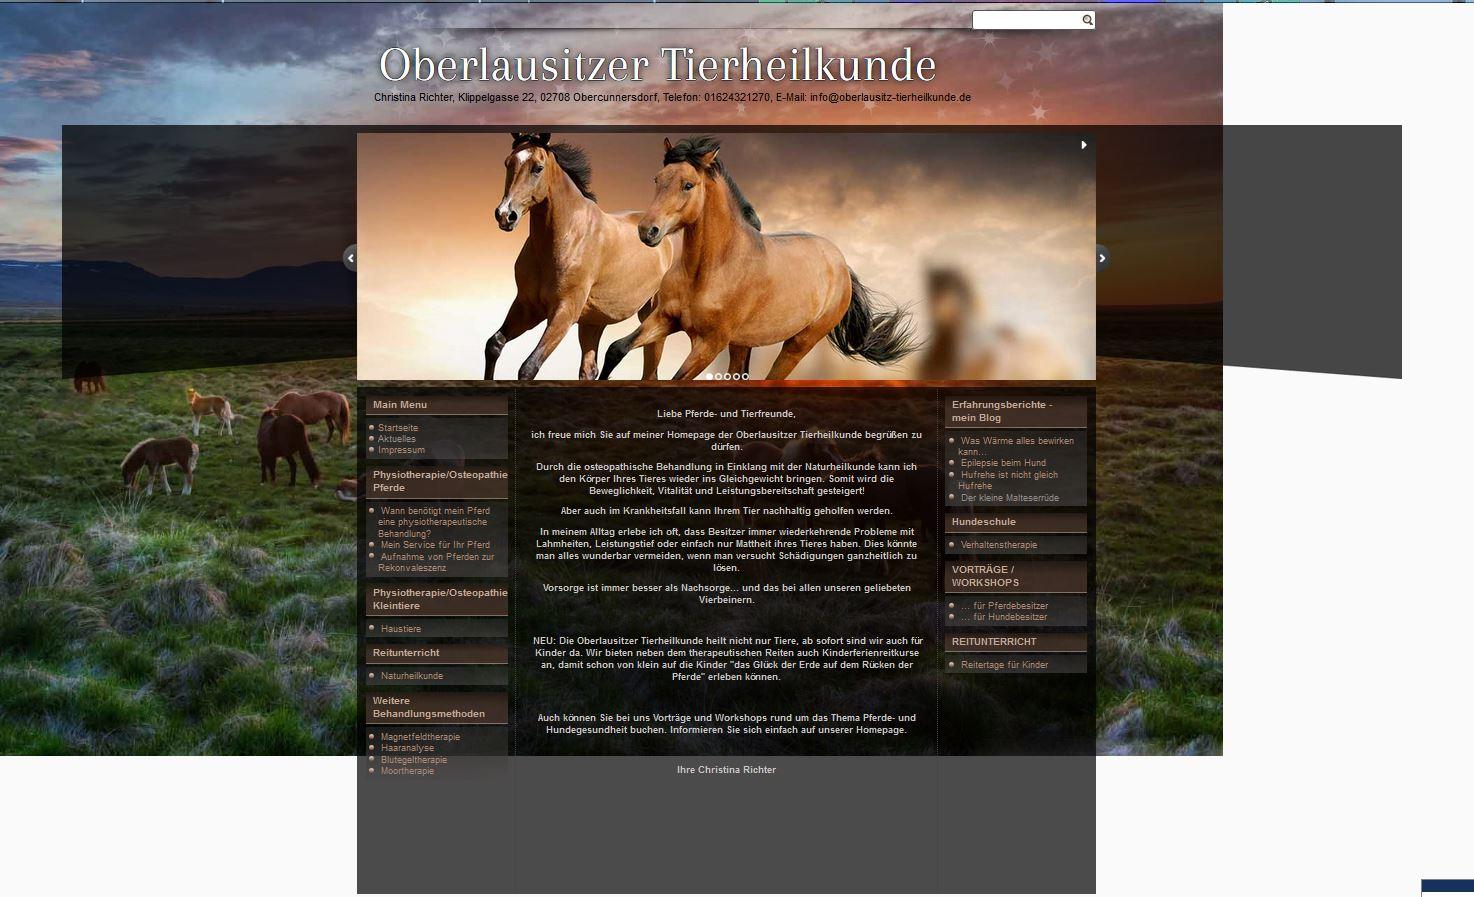 Oberlausitzer Pferdephysio.de